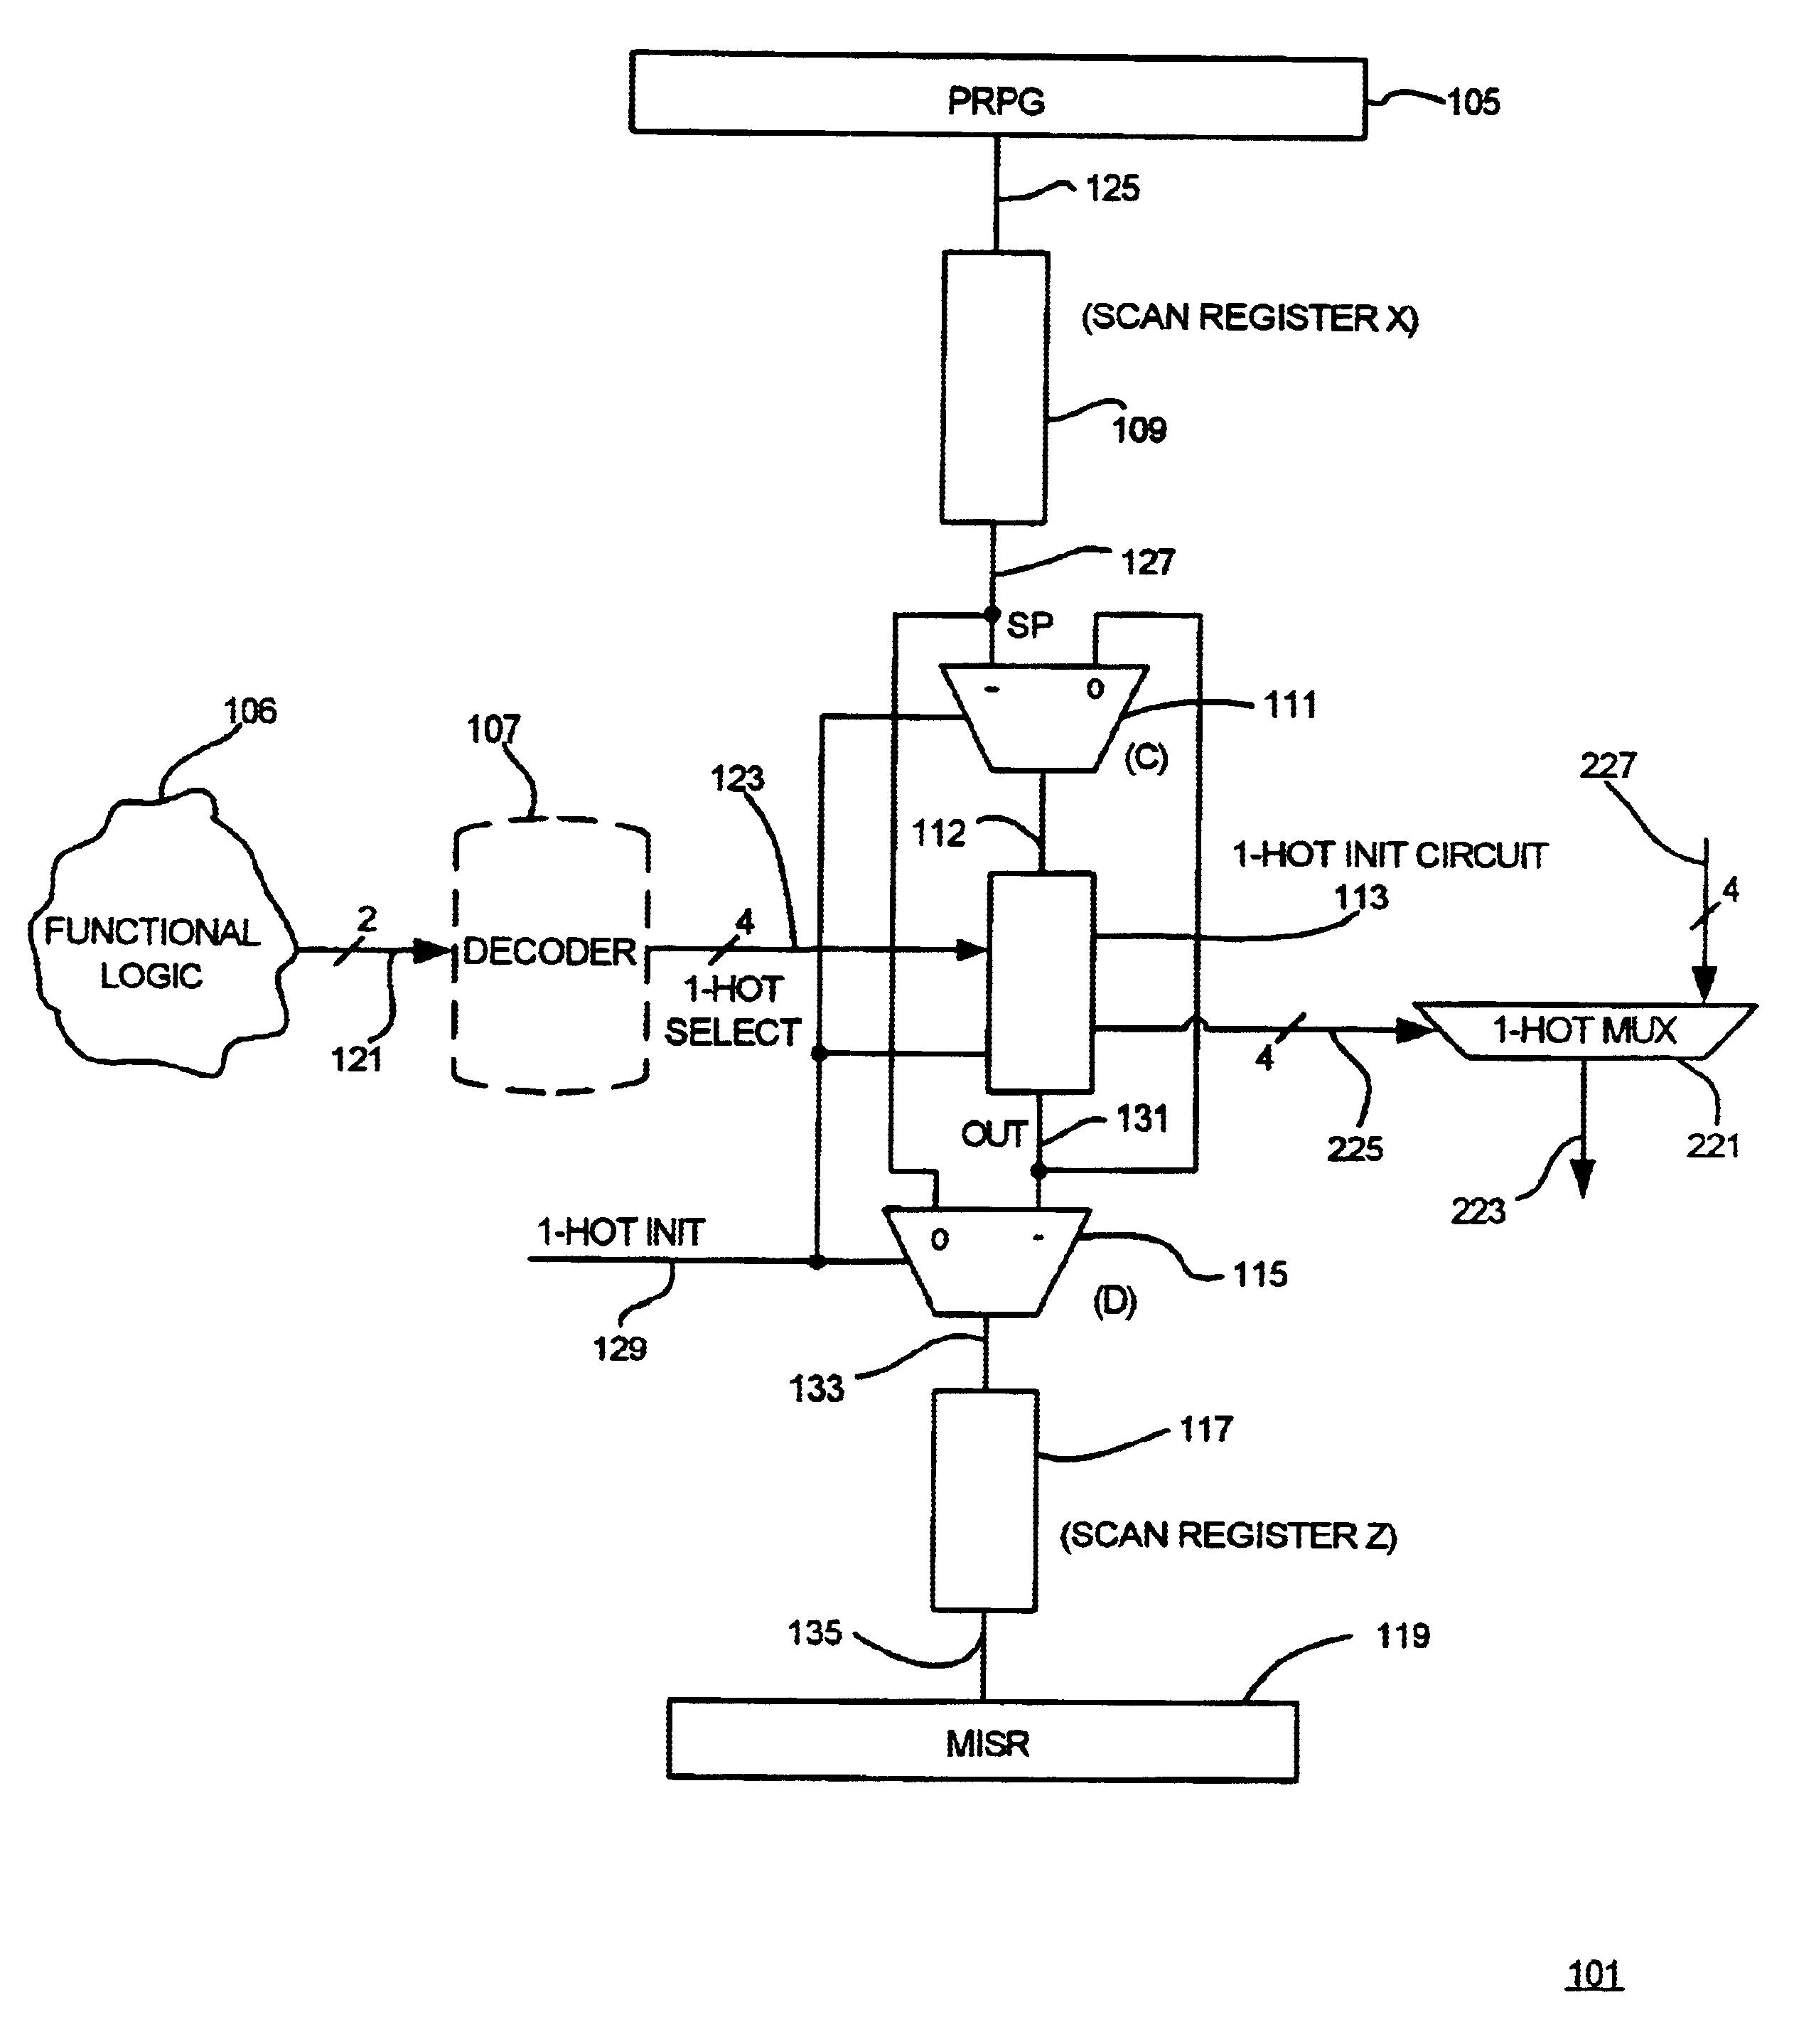 Brevet Us6658617 Handling A 1 Hot Multiplexer During Built In Self Logic Diagram Of Patent Drawing